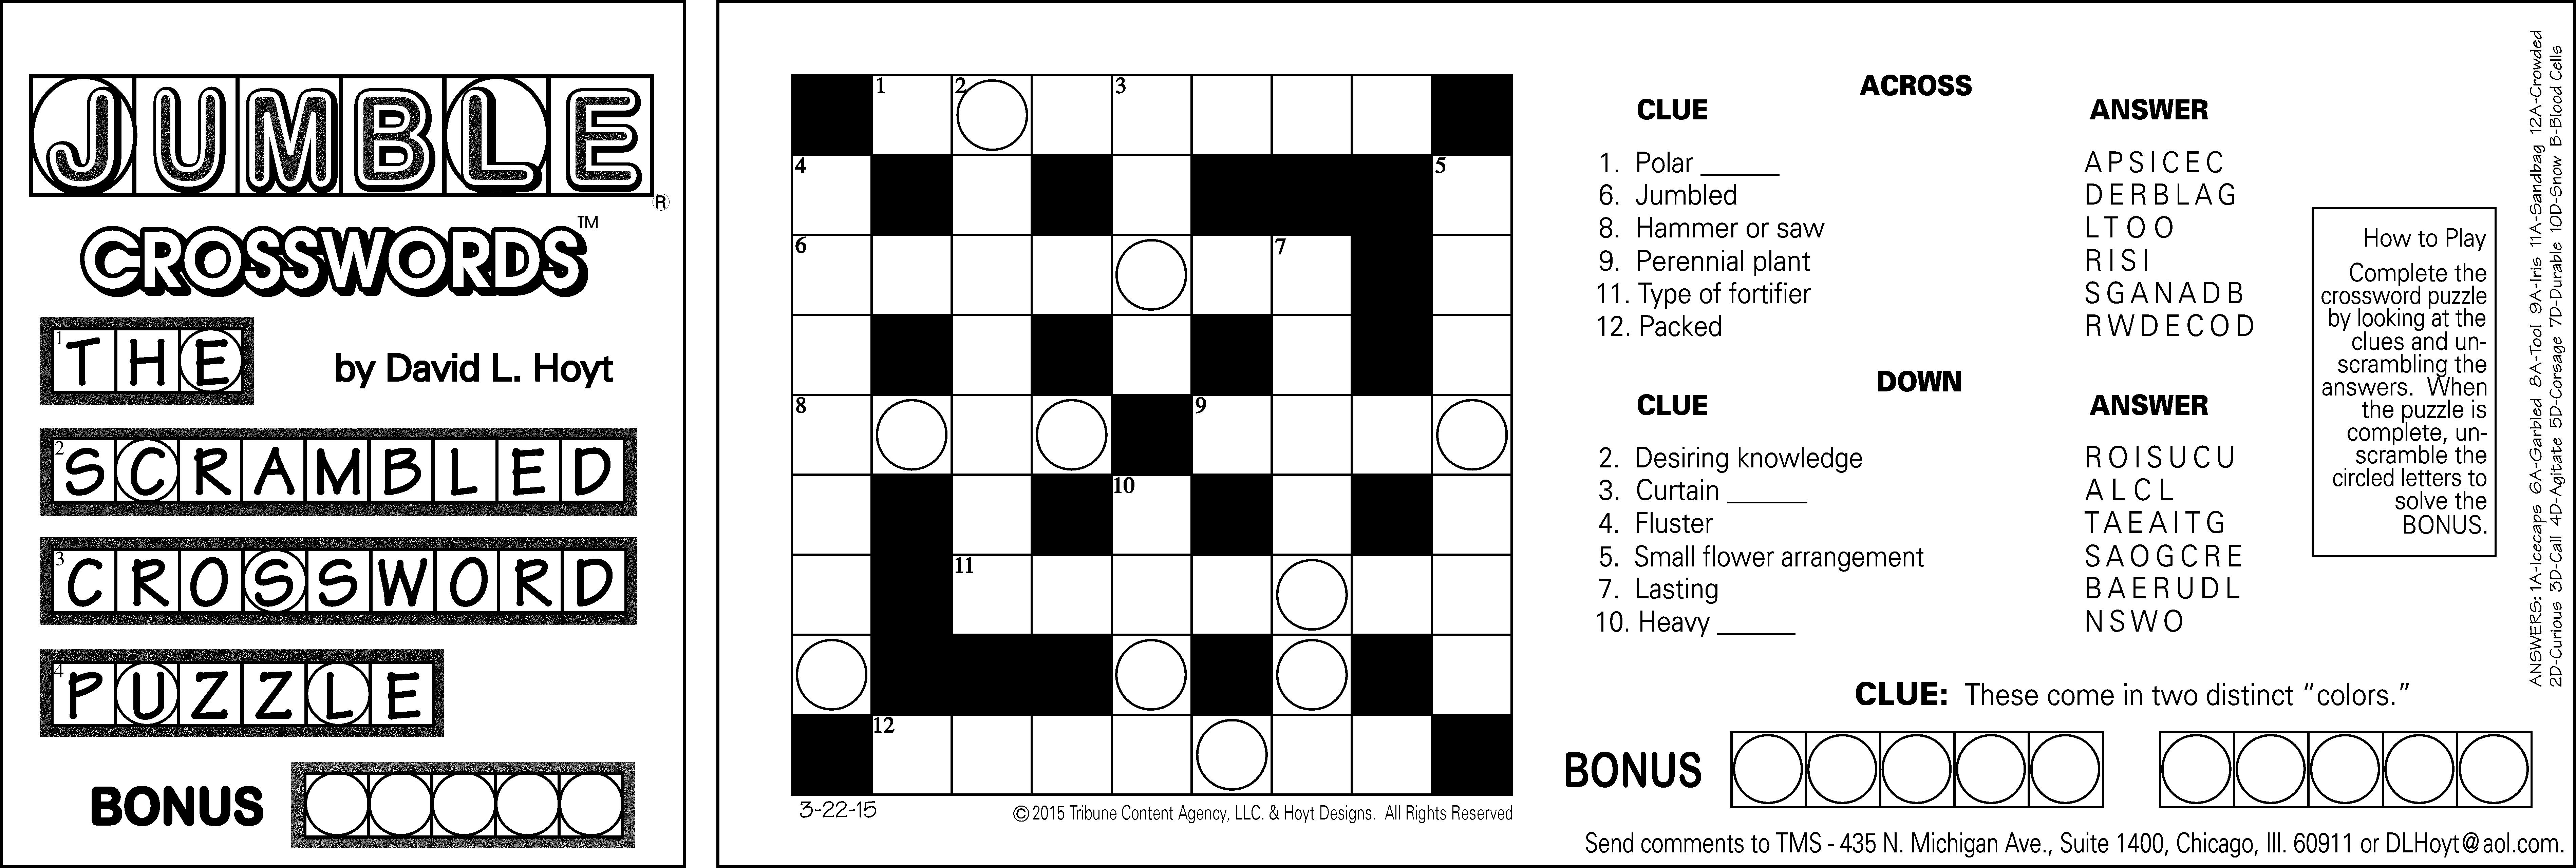 Sample Of Horizontal Sunday Jumble Crosswords | Tribune Content - Printable Jumble Crossword Puzzles